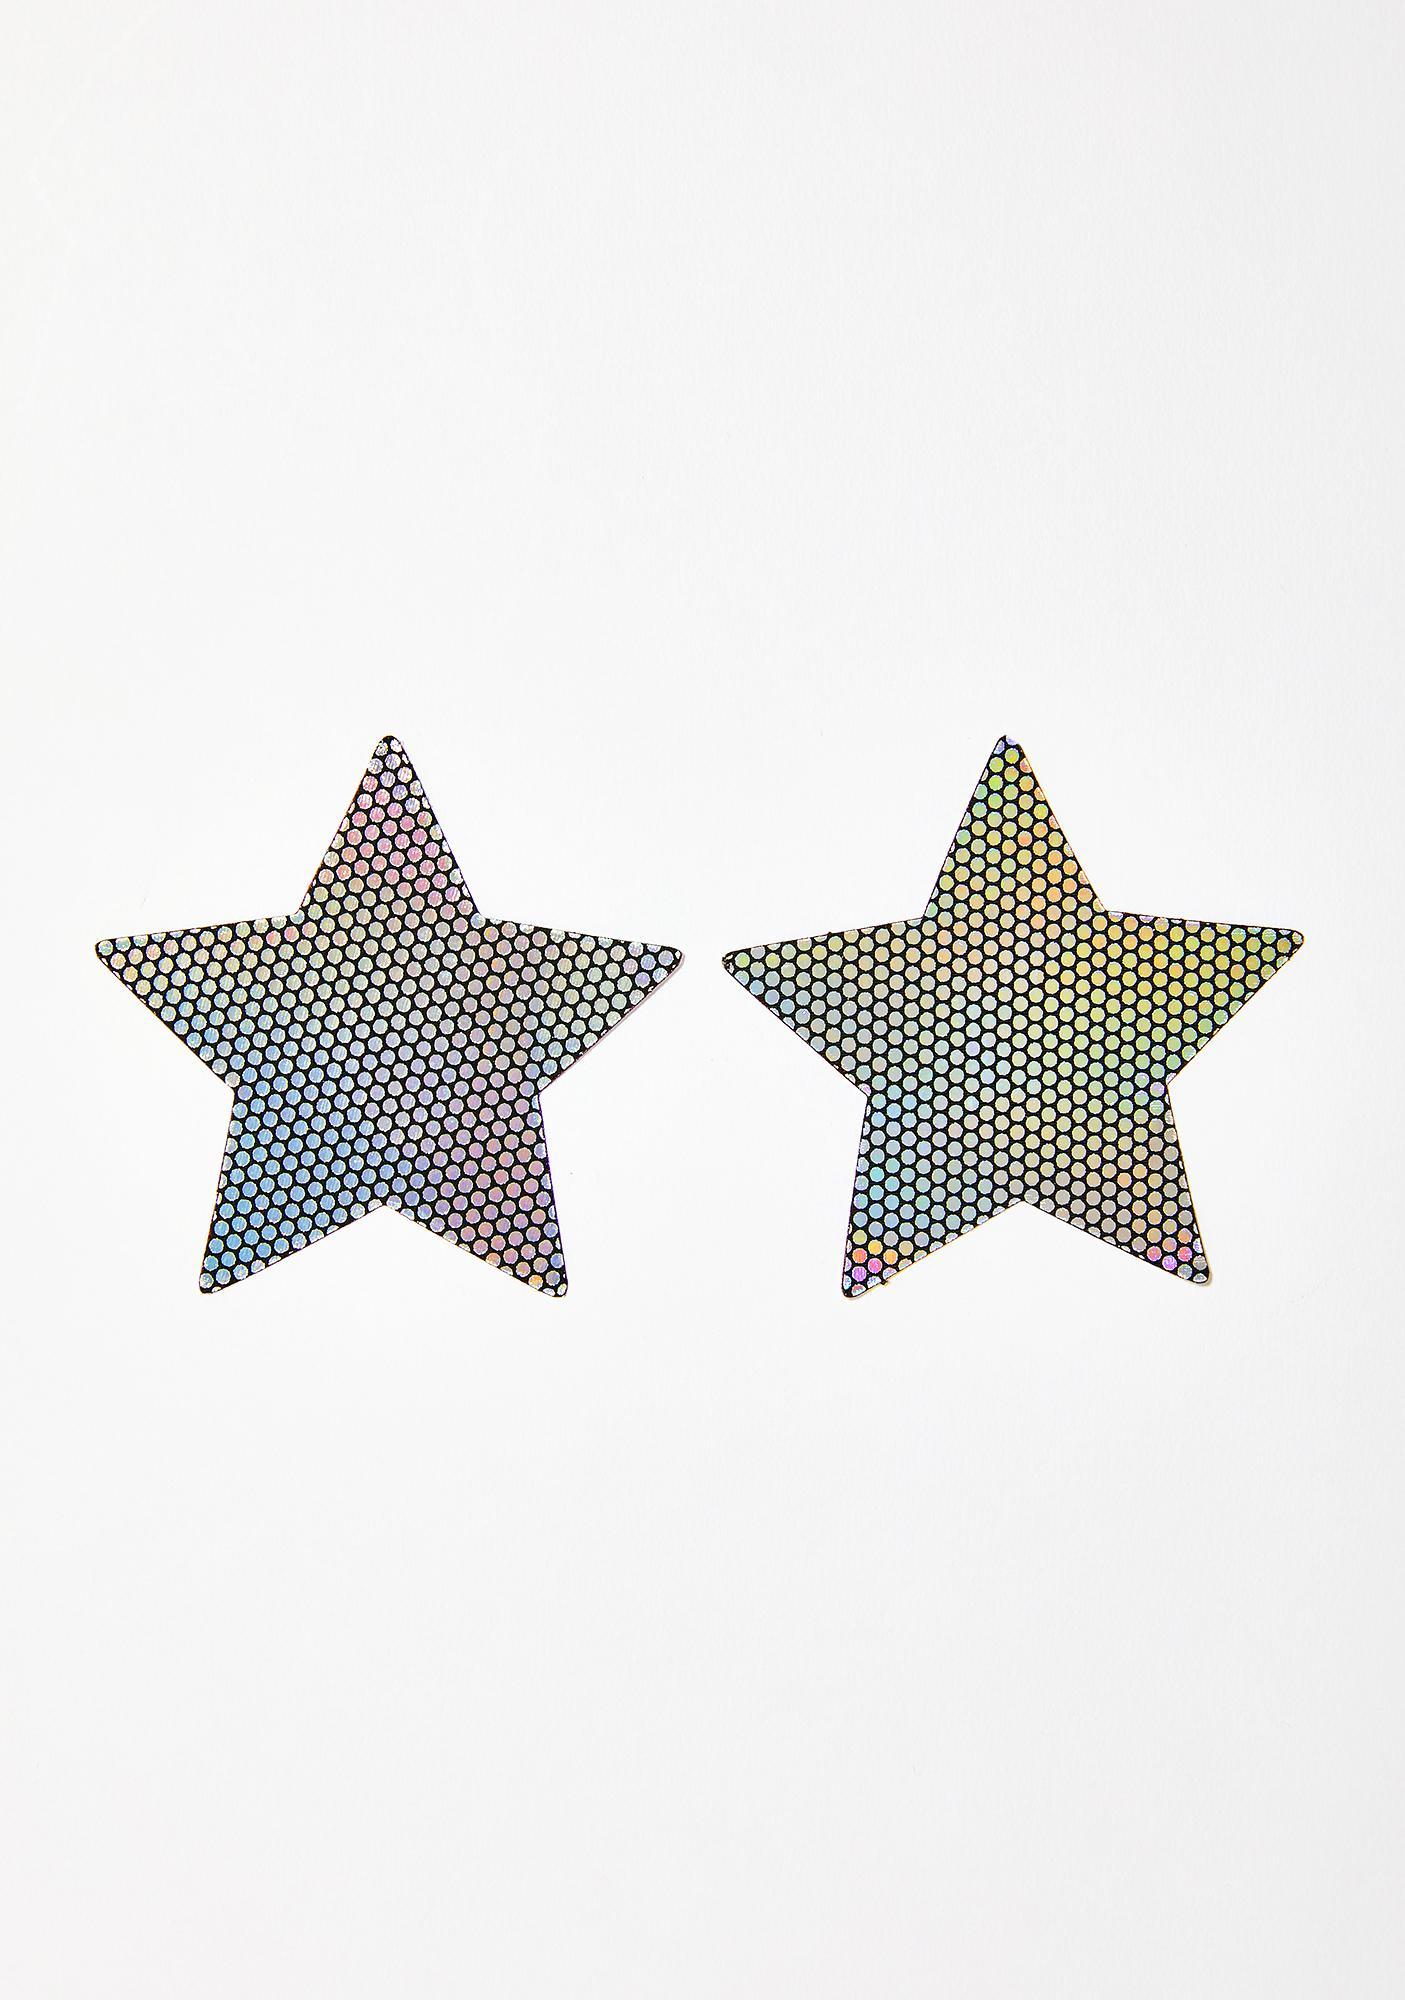 Neva Nude Liquid Party Holographic Star Pasties